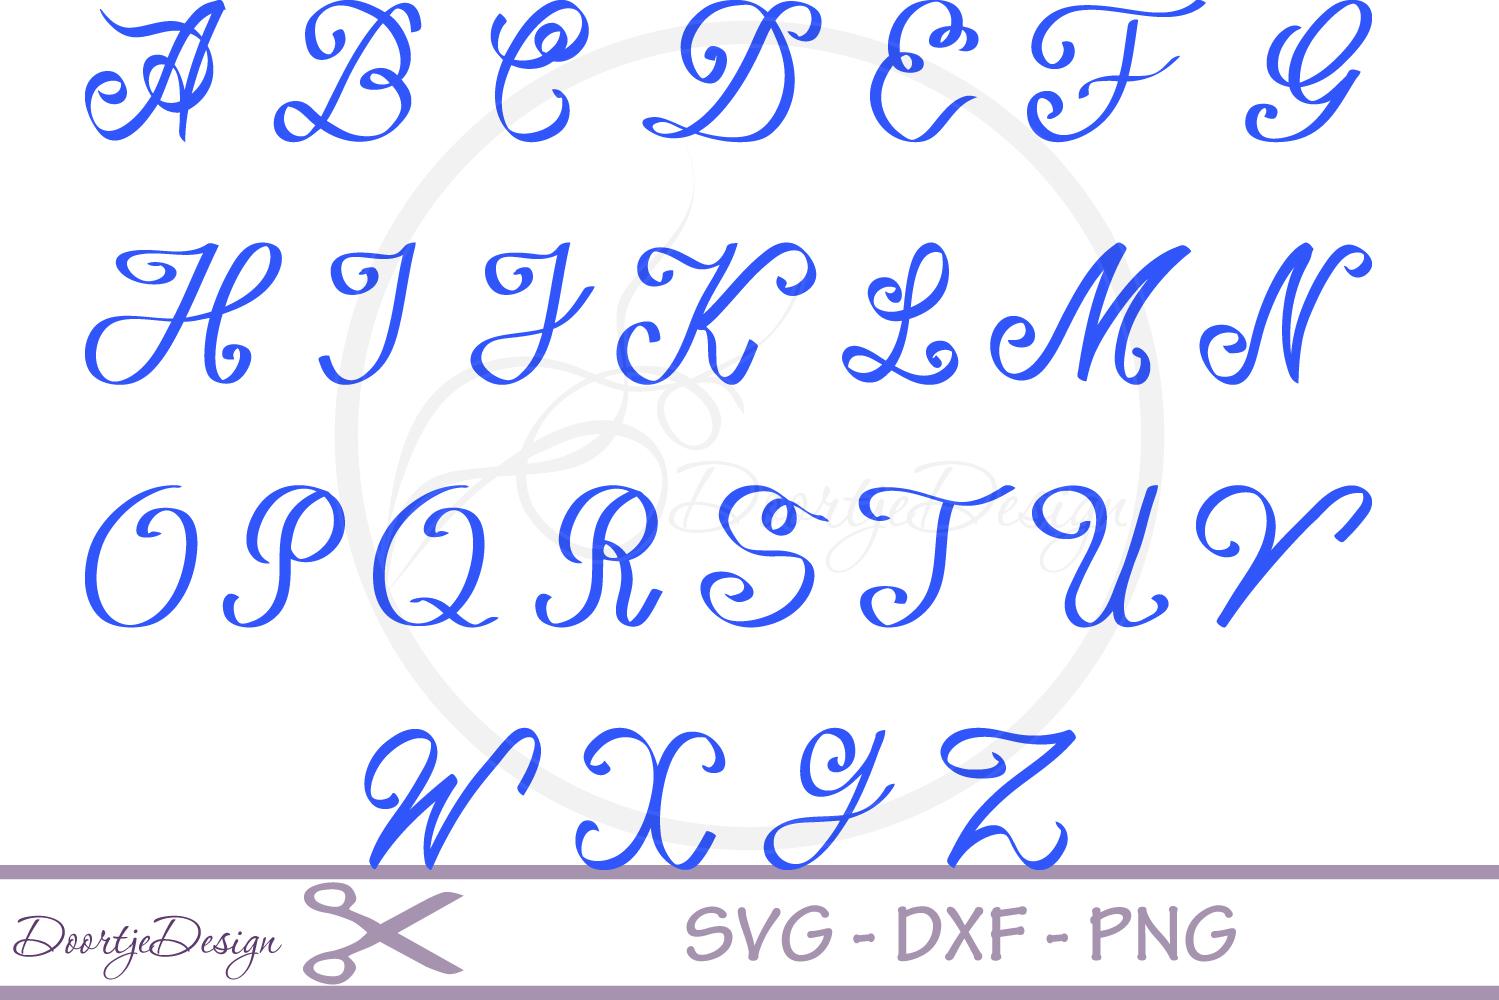 Script Alphabet Font SVG example image 2